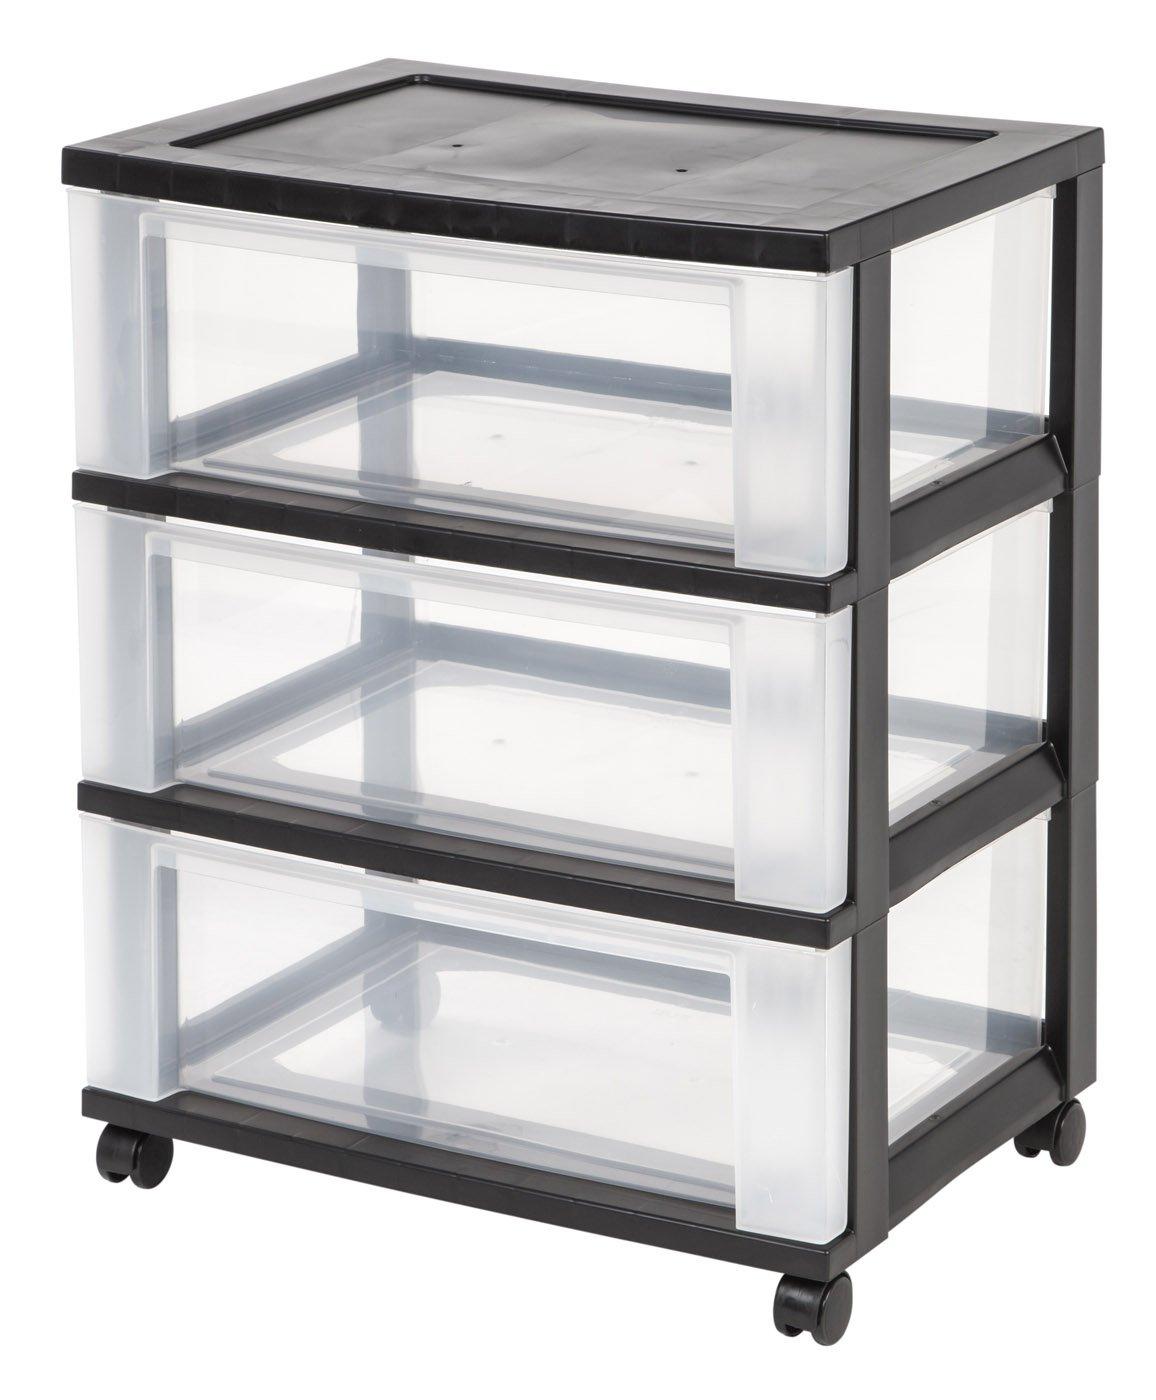 IRIS 3-Drawer Wide Cart, Black by IRIS USA, Inc.